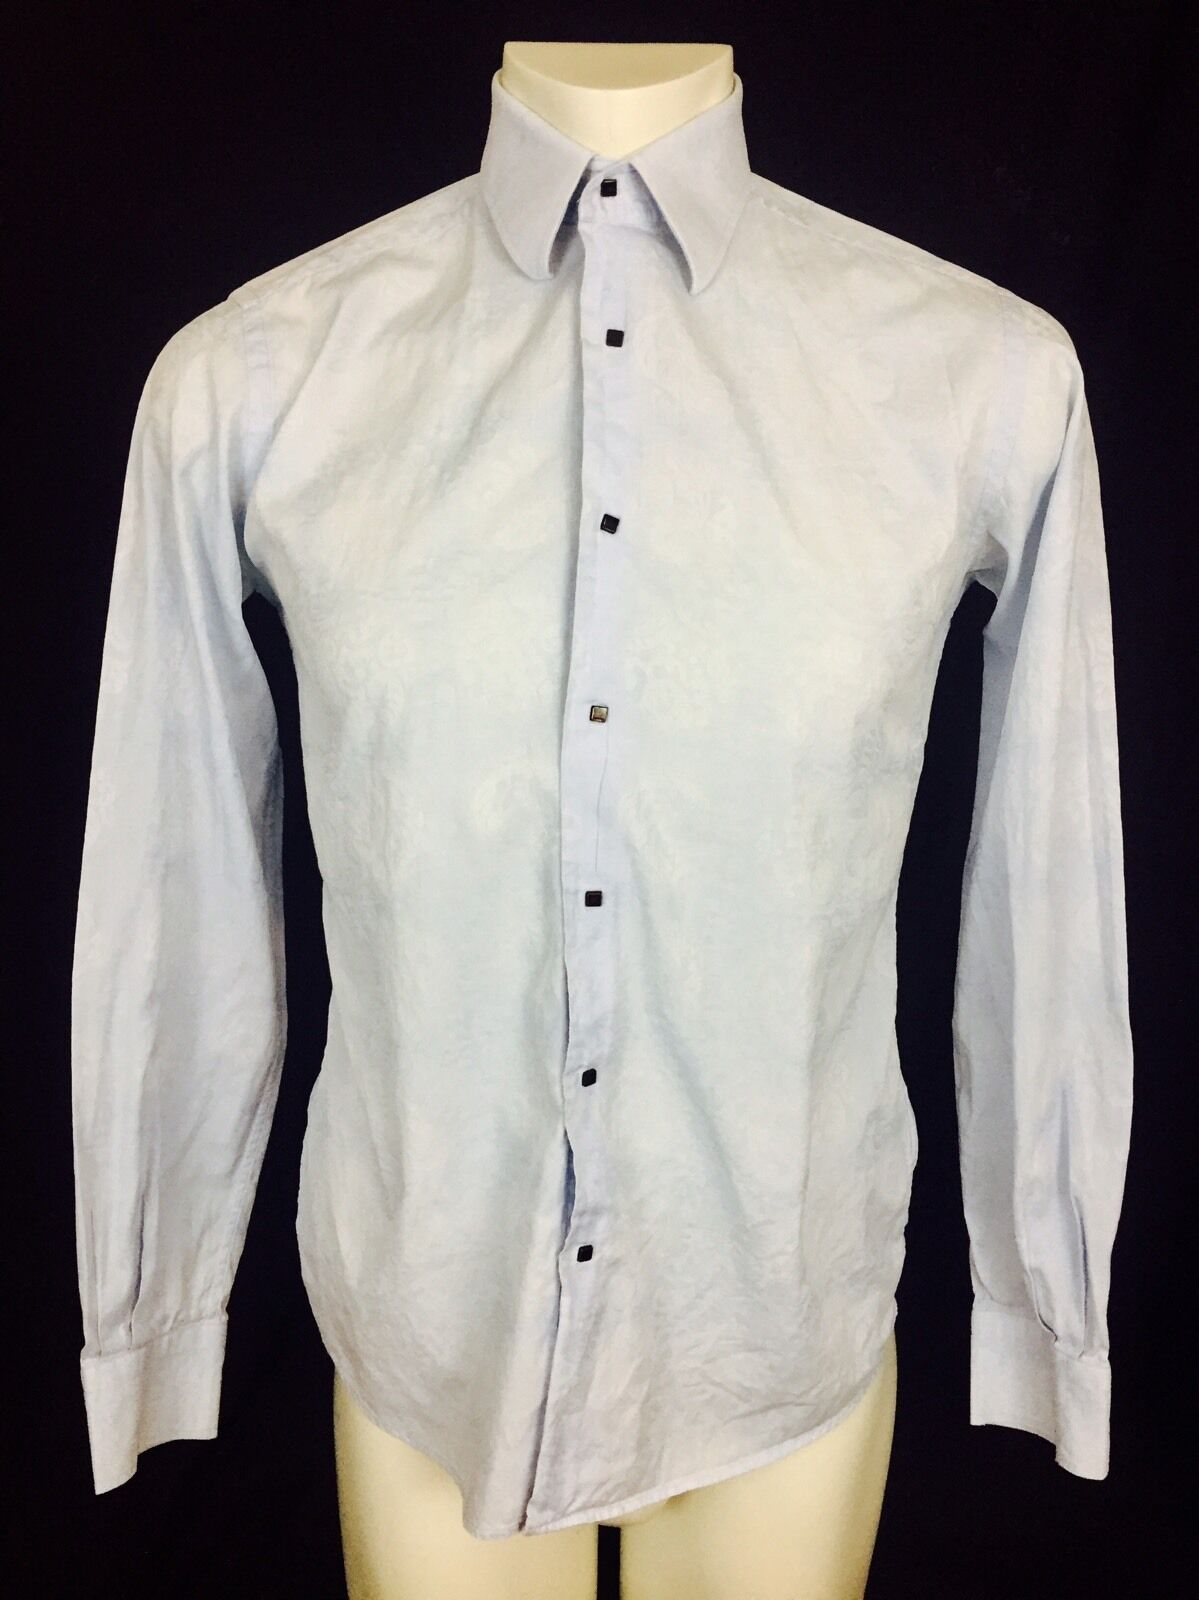 Karl Lagerfeld Damask Floral Copper Snap Men's Dress Shirt Size 38 bluee